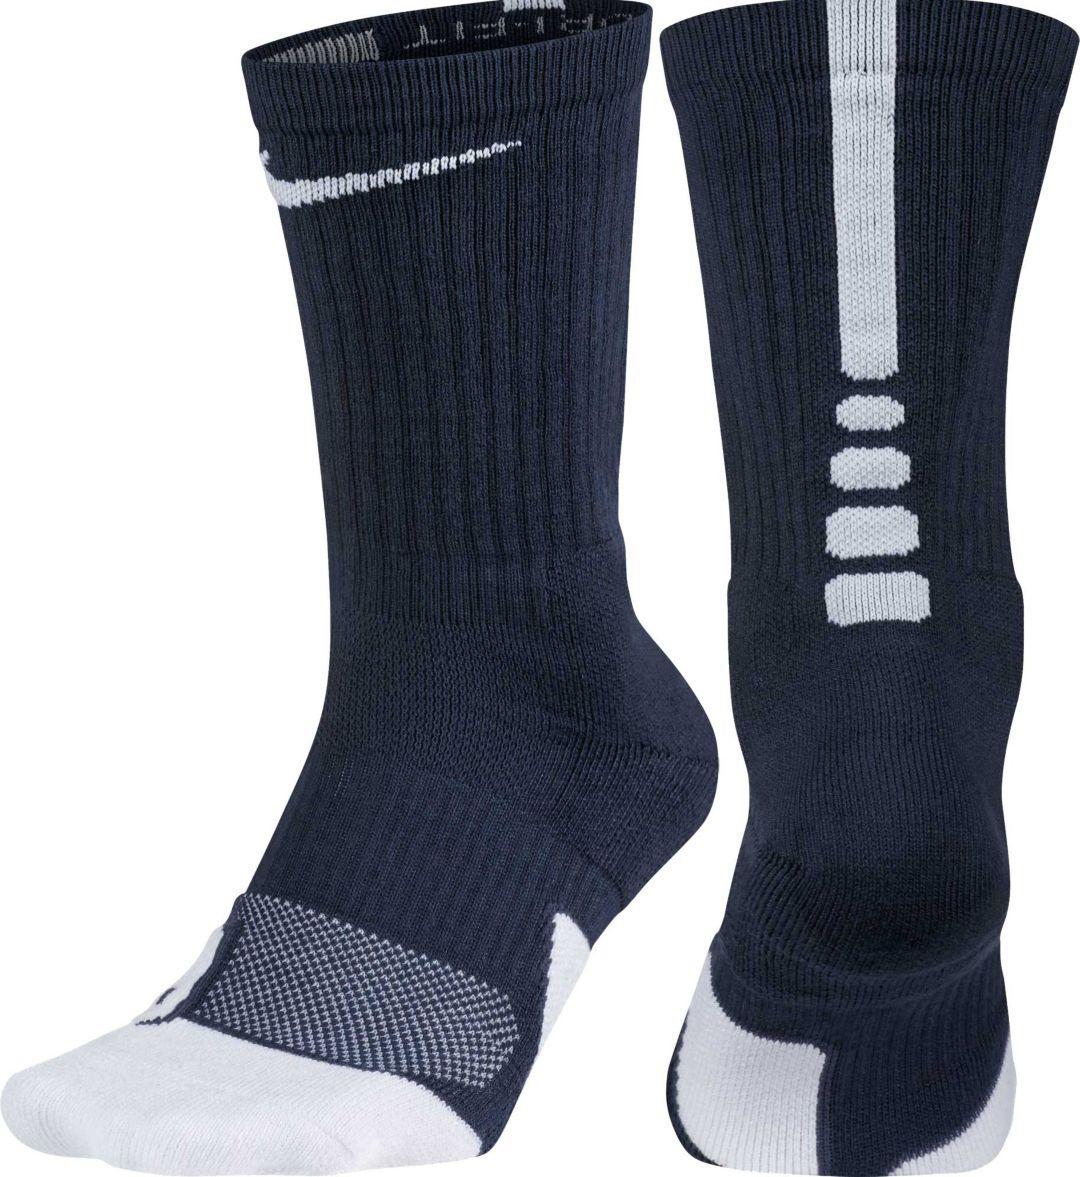 premium selection e1124 22dad Nike Dry Elite 1.5 Crew Basketball Socks 1